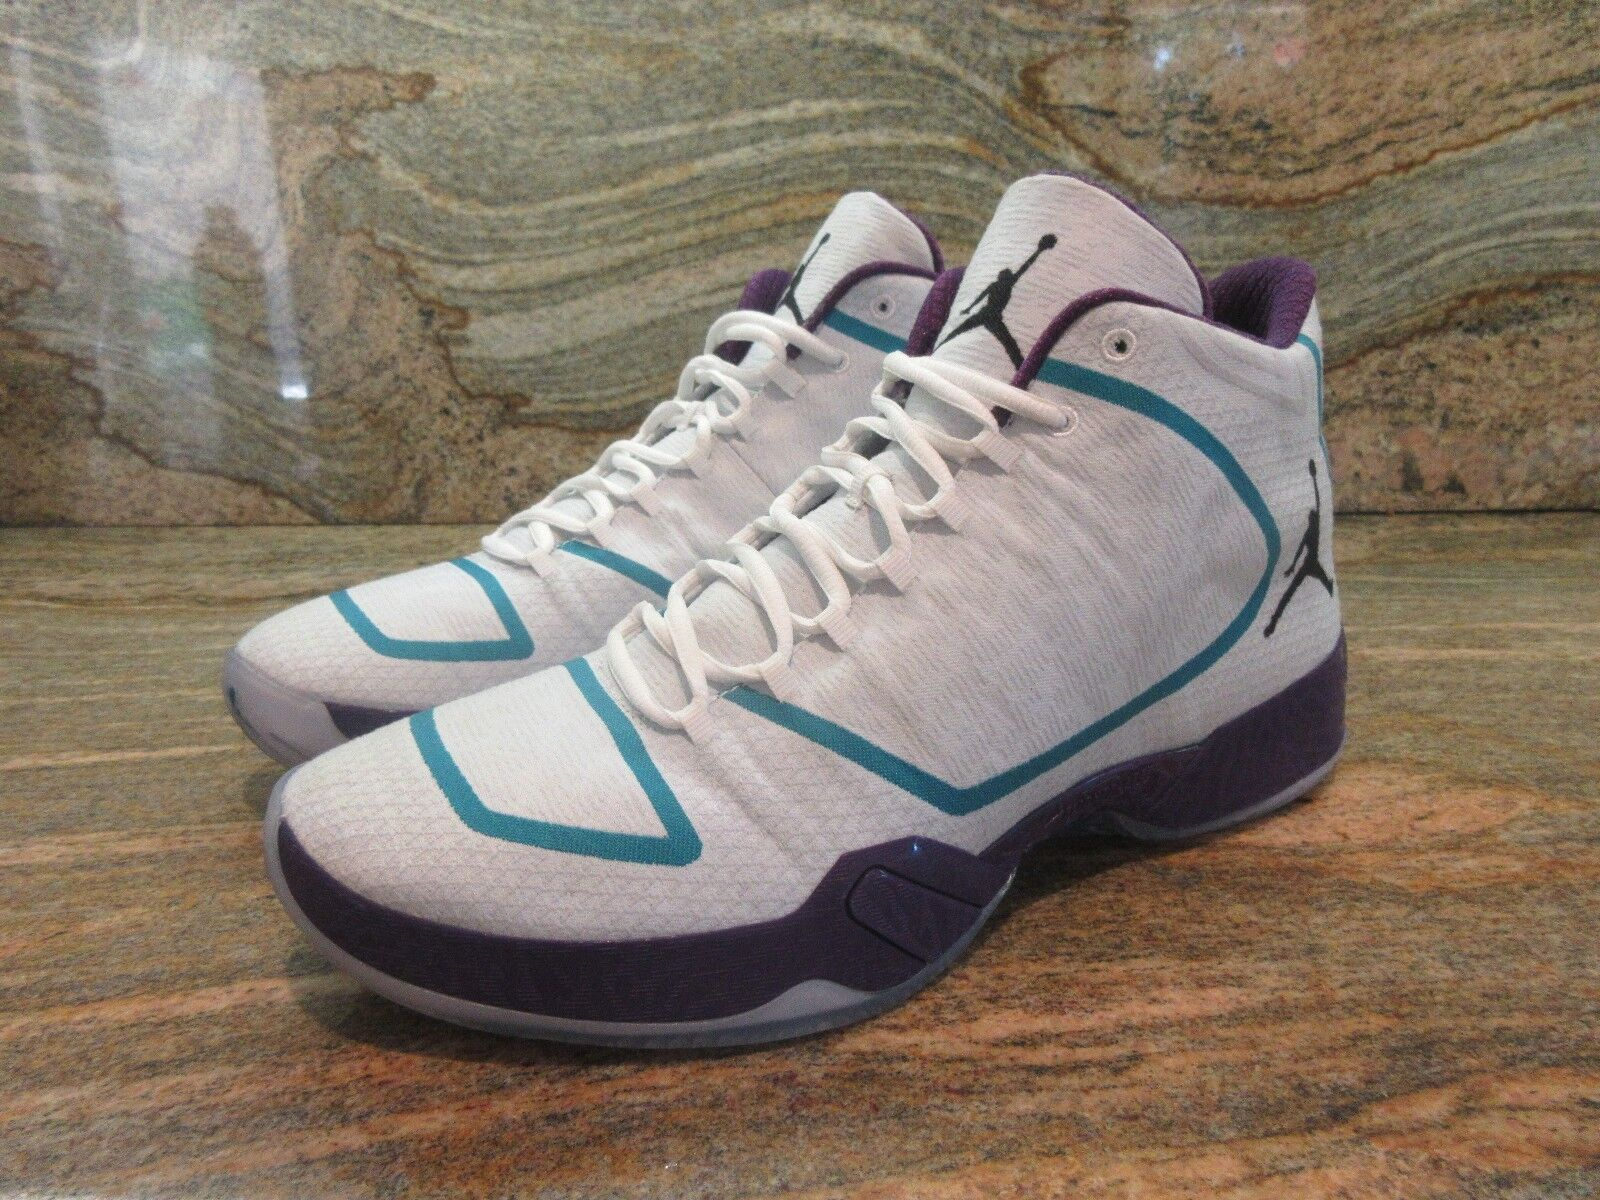 new arrival 68409 ba078 ... Unreleased Nike Air Jordan XX9 XX9 XX9 29 Promo Sample SZ 13 Charlotte  Hornets MJ CEO ...